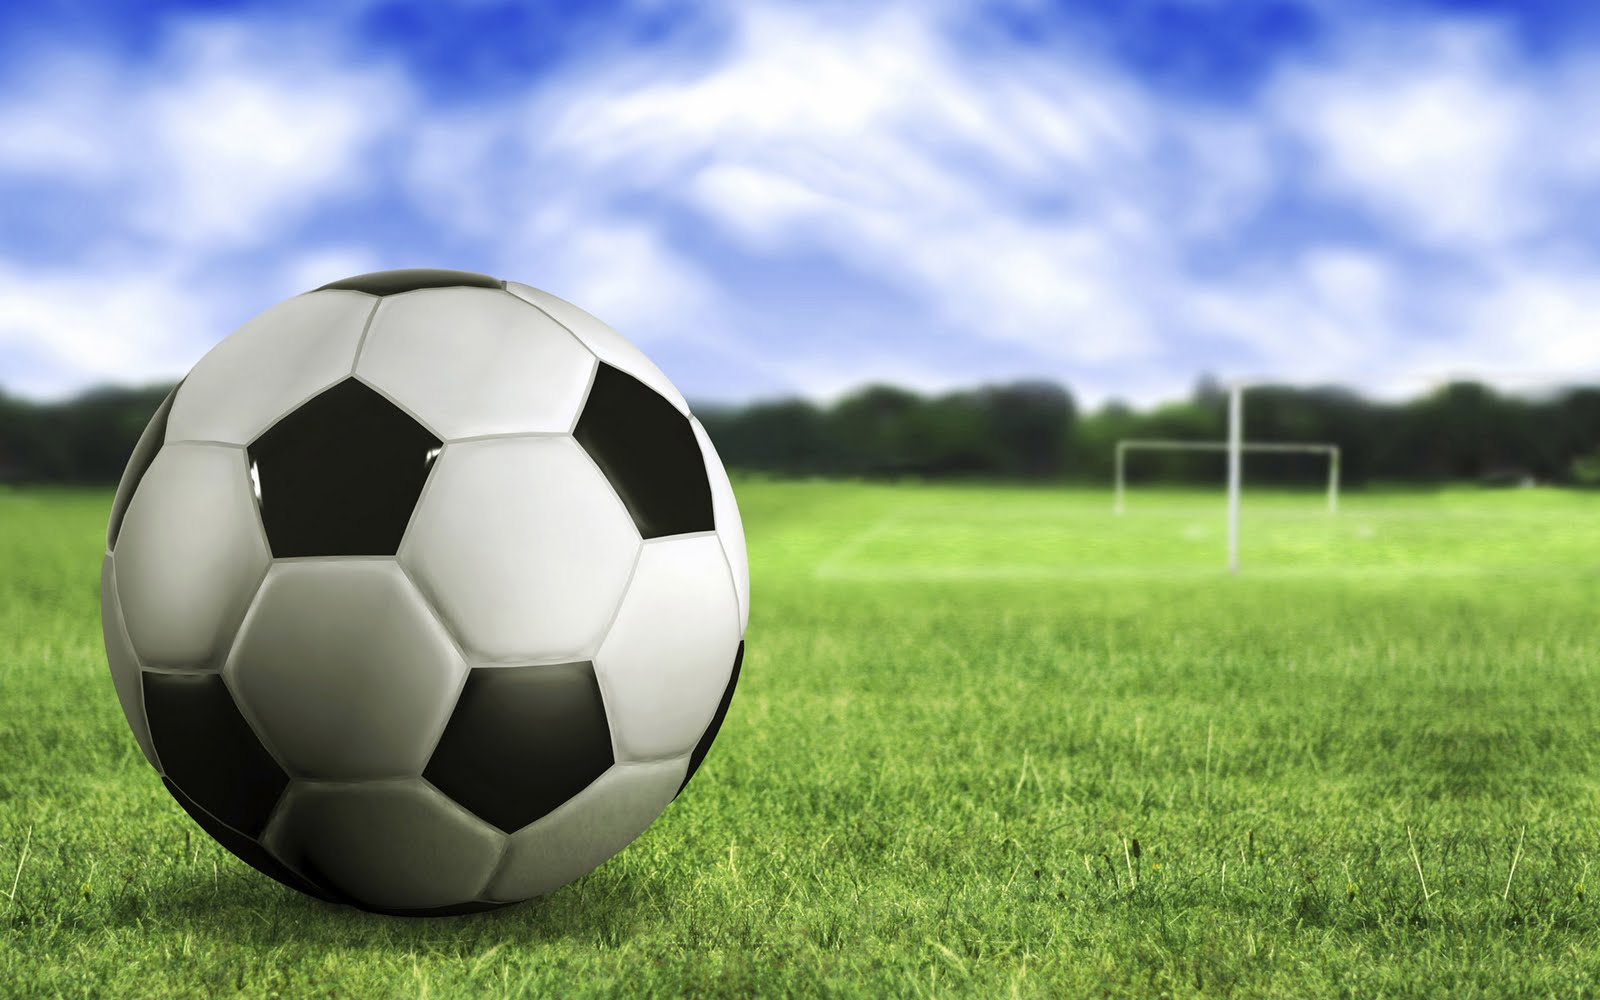 Football Pc Wallpaper: Football Wallpaper: HD Football Soccer Wallpaper Pictures